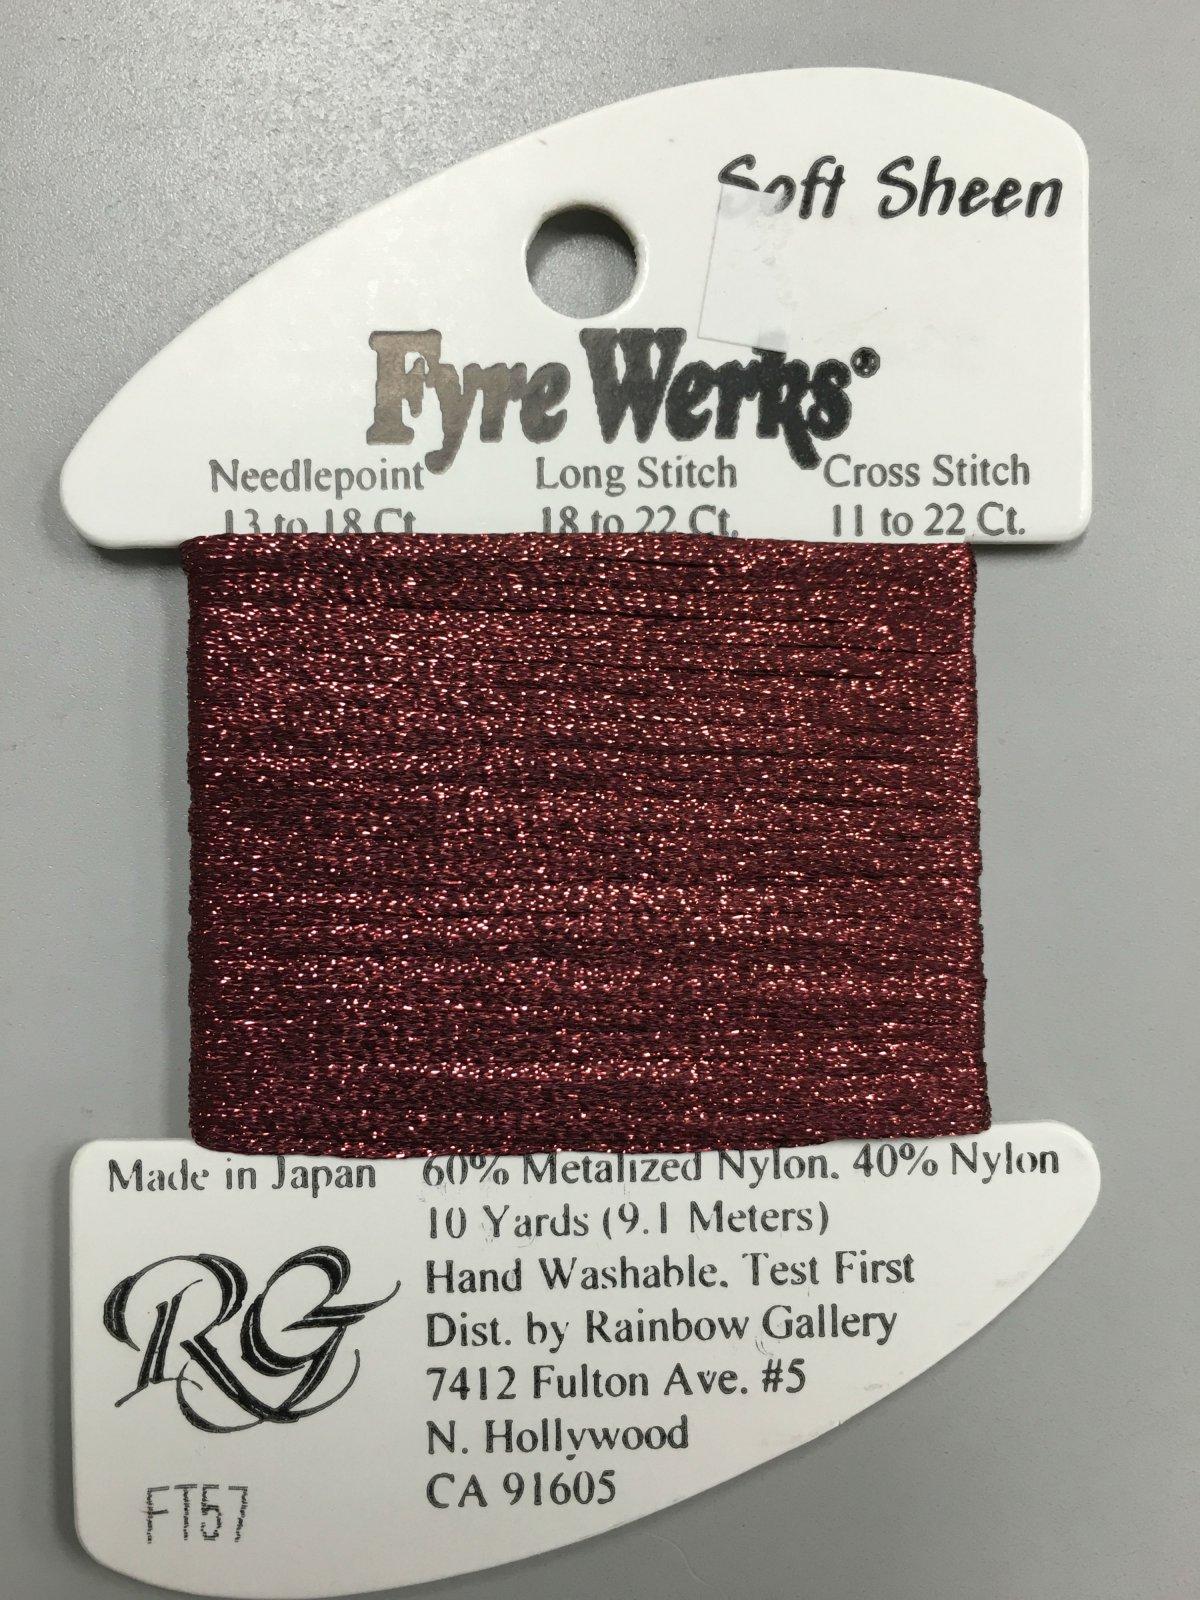 Fyre Werks Soft Sheen FT57